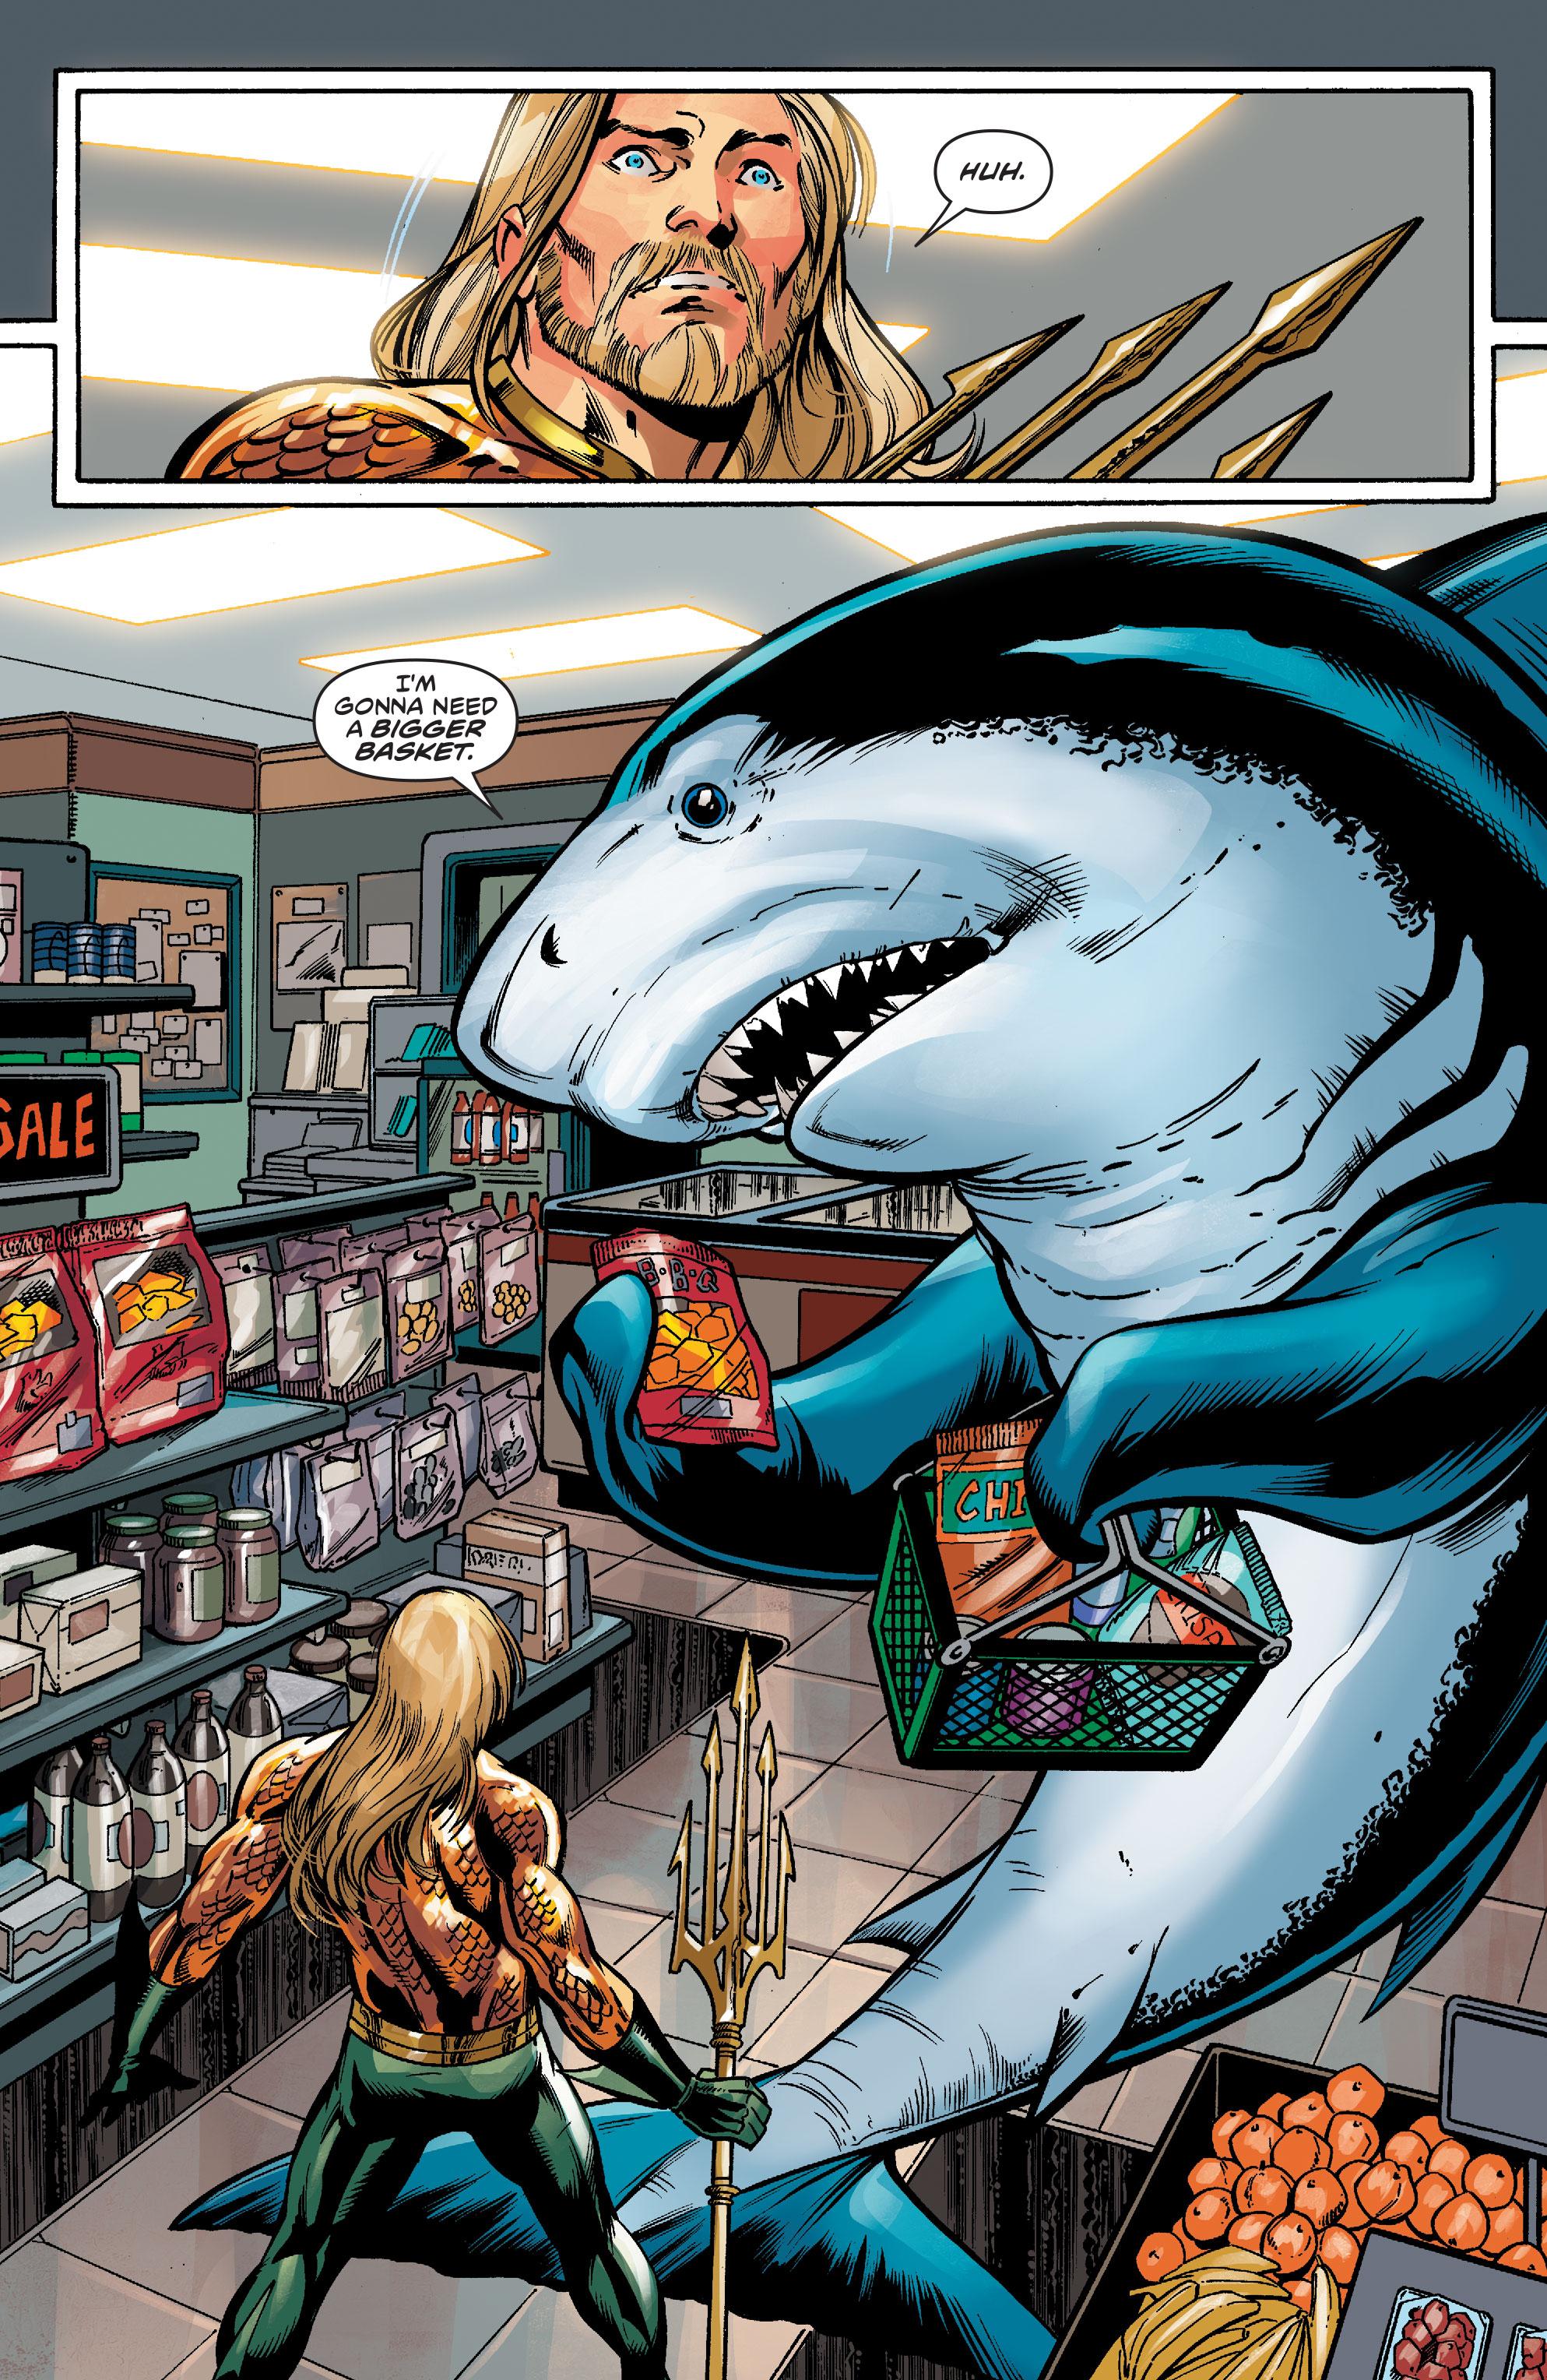 Shazam Aquaman Get New Magazine Covers: Review: Aquaman/Jabberjaw Special #1